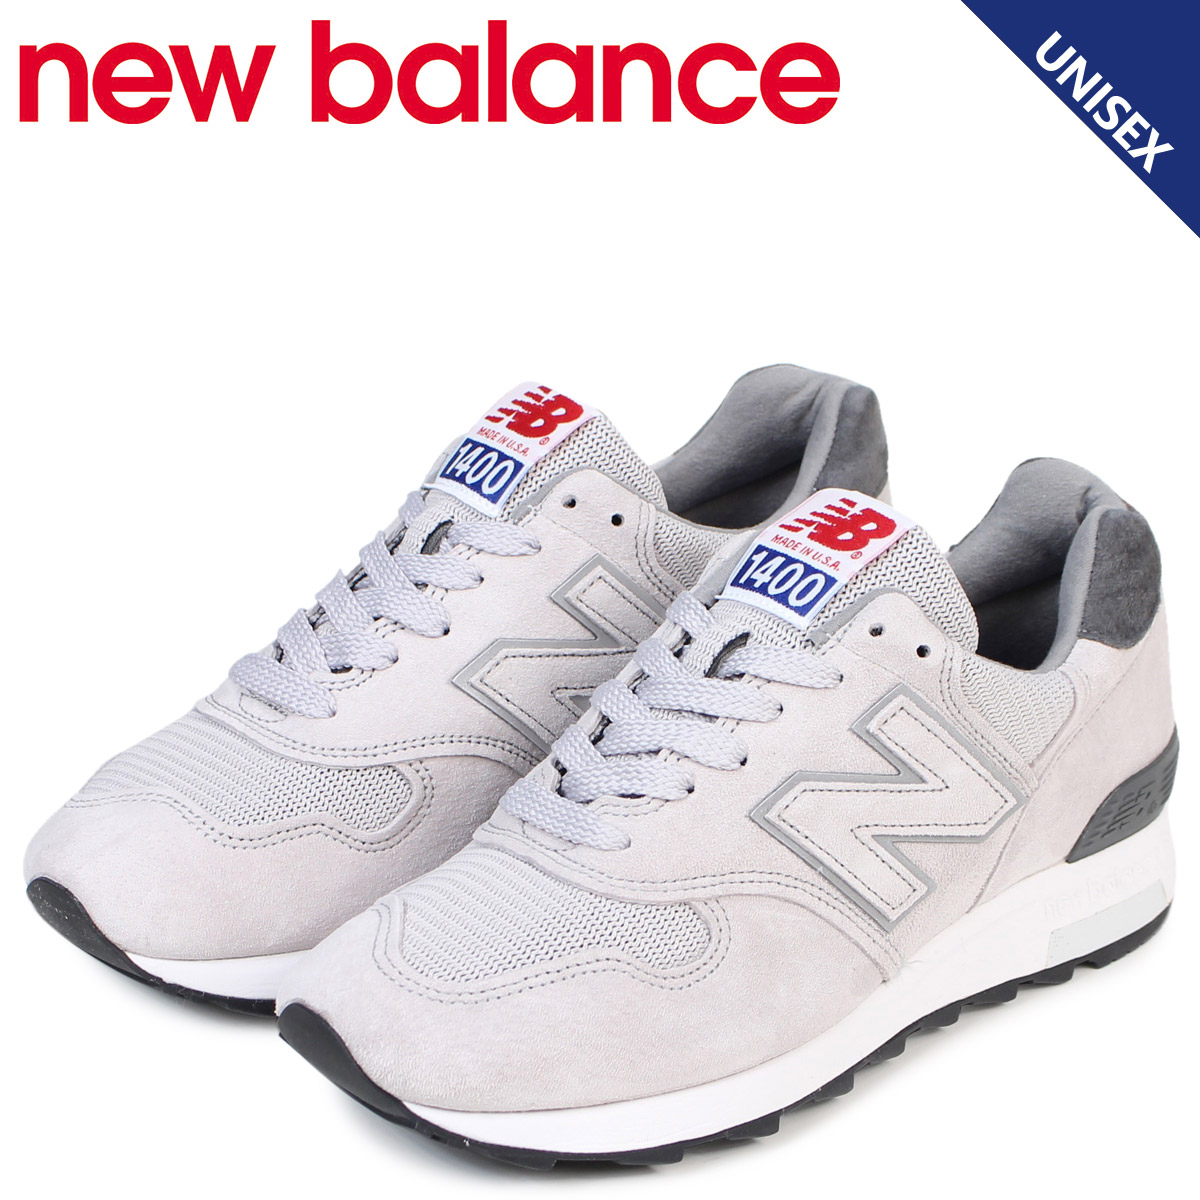 new balance 1400 jp